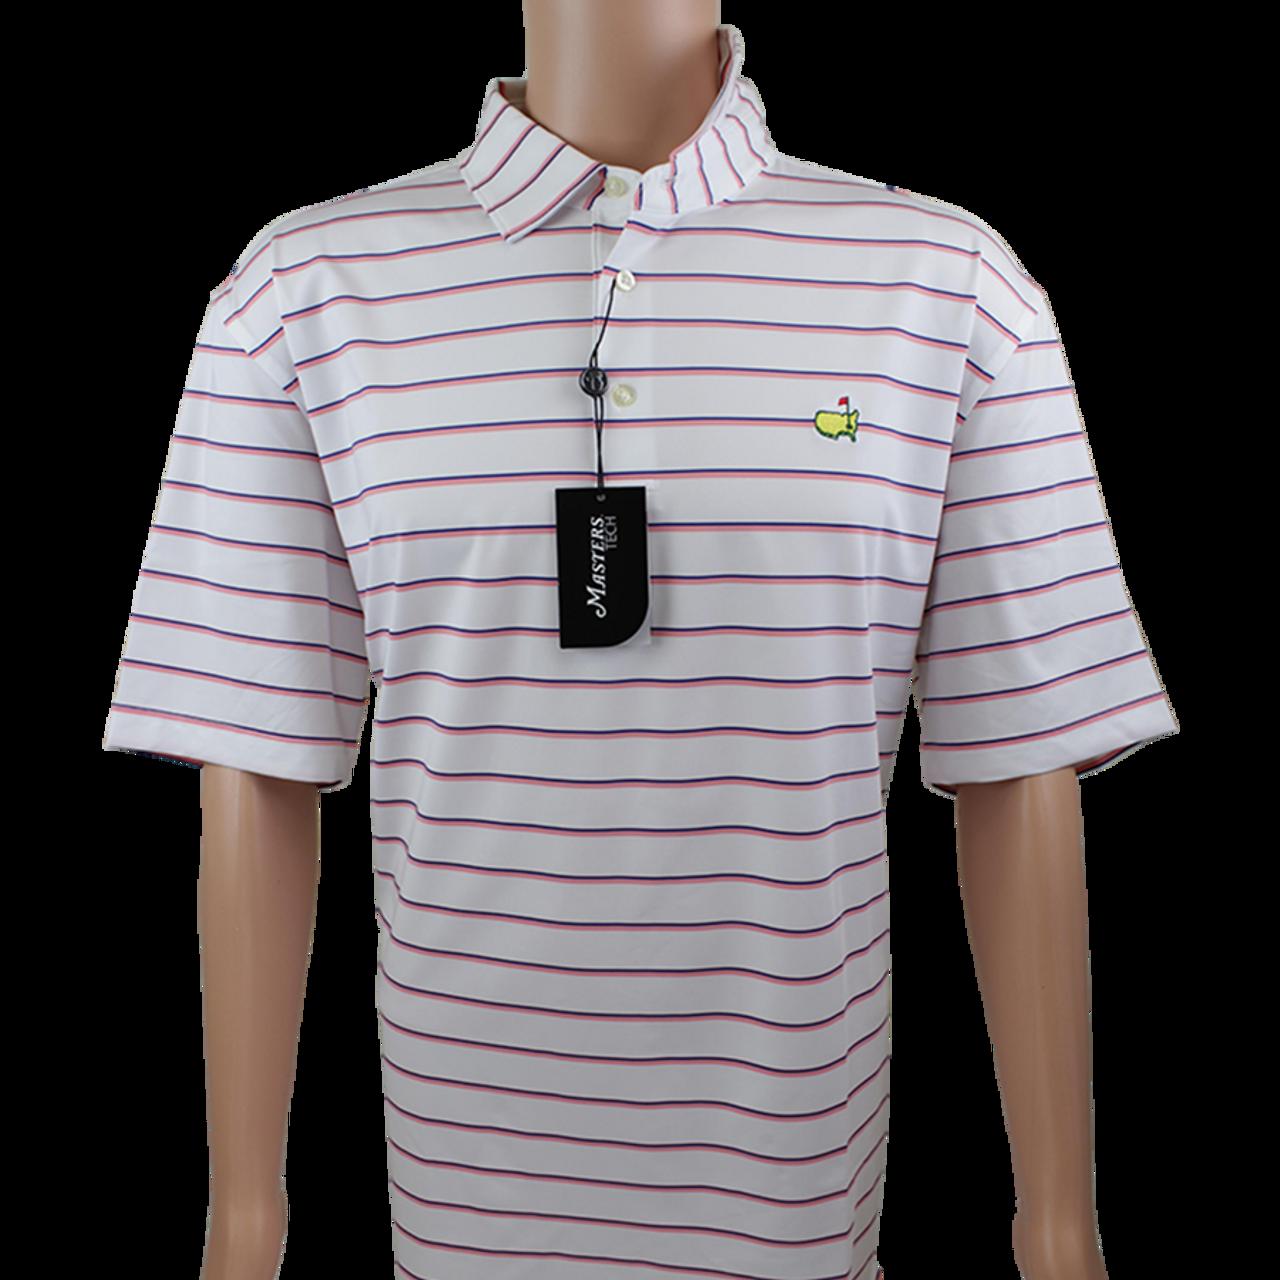 19a8ceba3a9 Masters White   Pink Navy Striped Performance Tech Golf Shirt